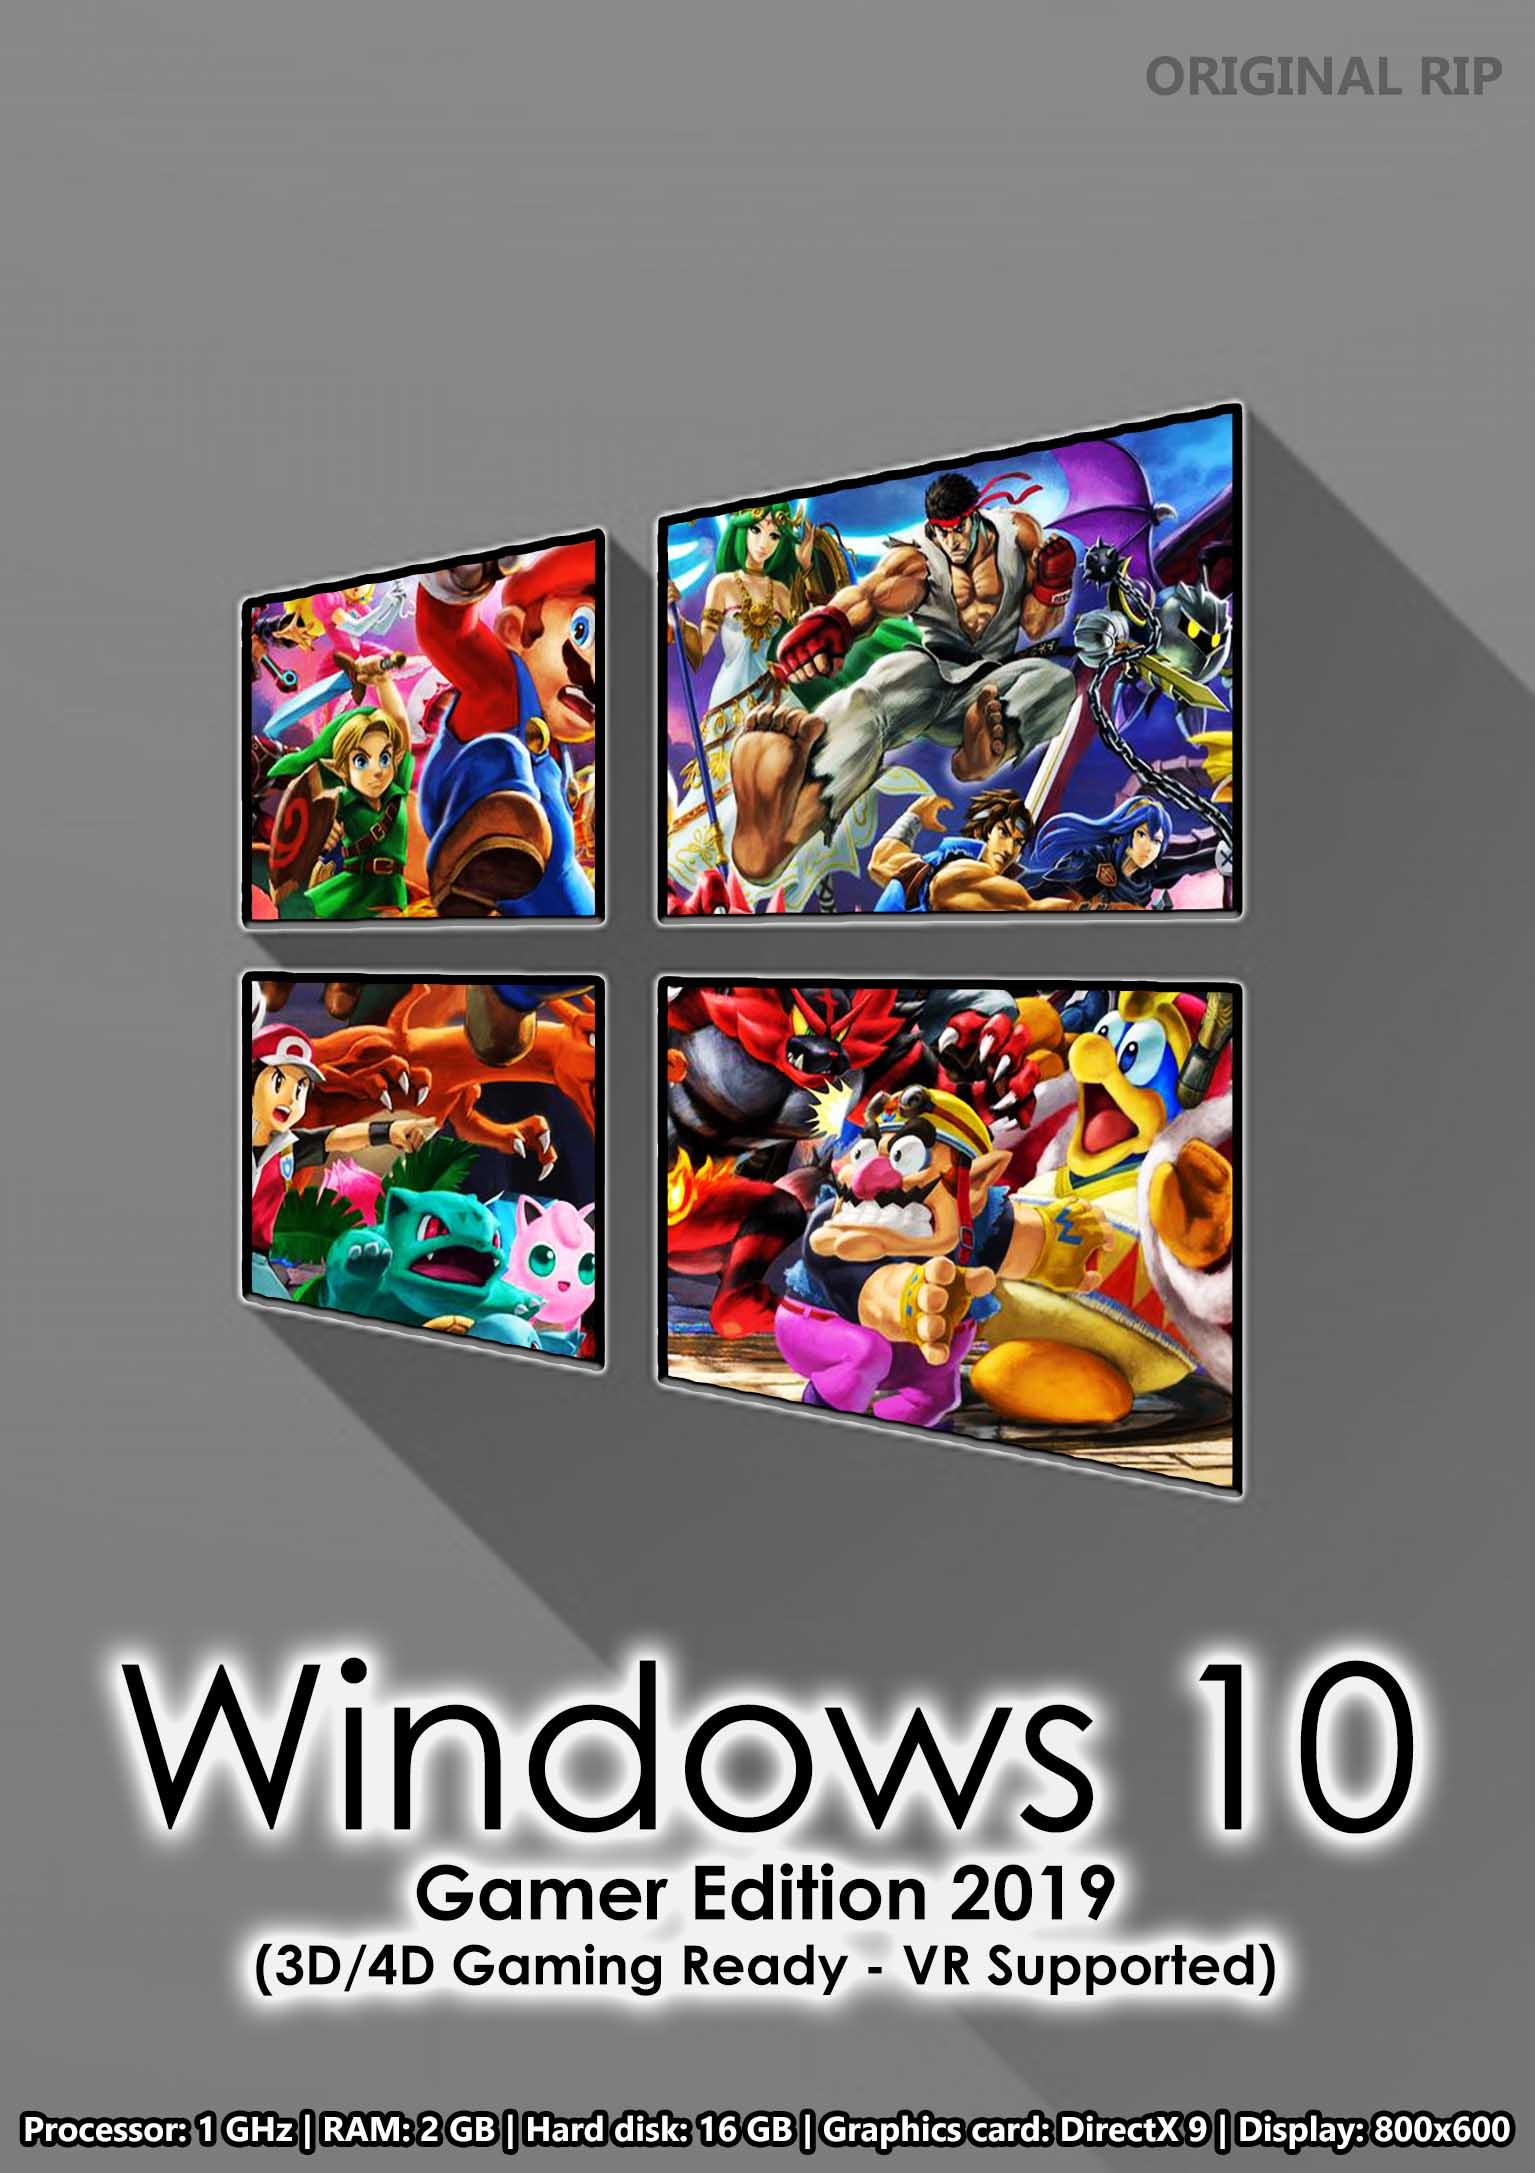 Windows 10 Gamer Edition 2019 (Latest Updates)